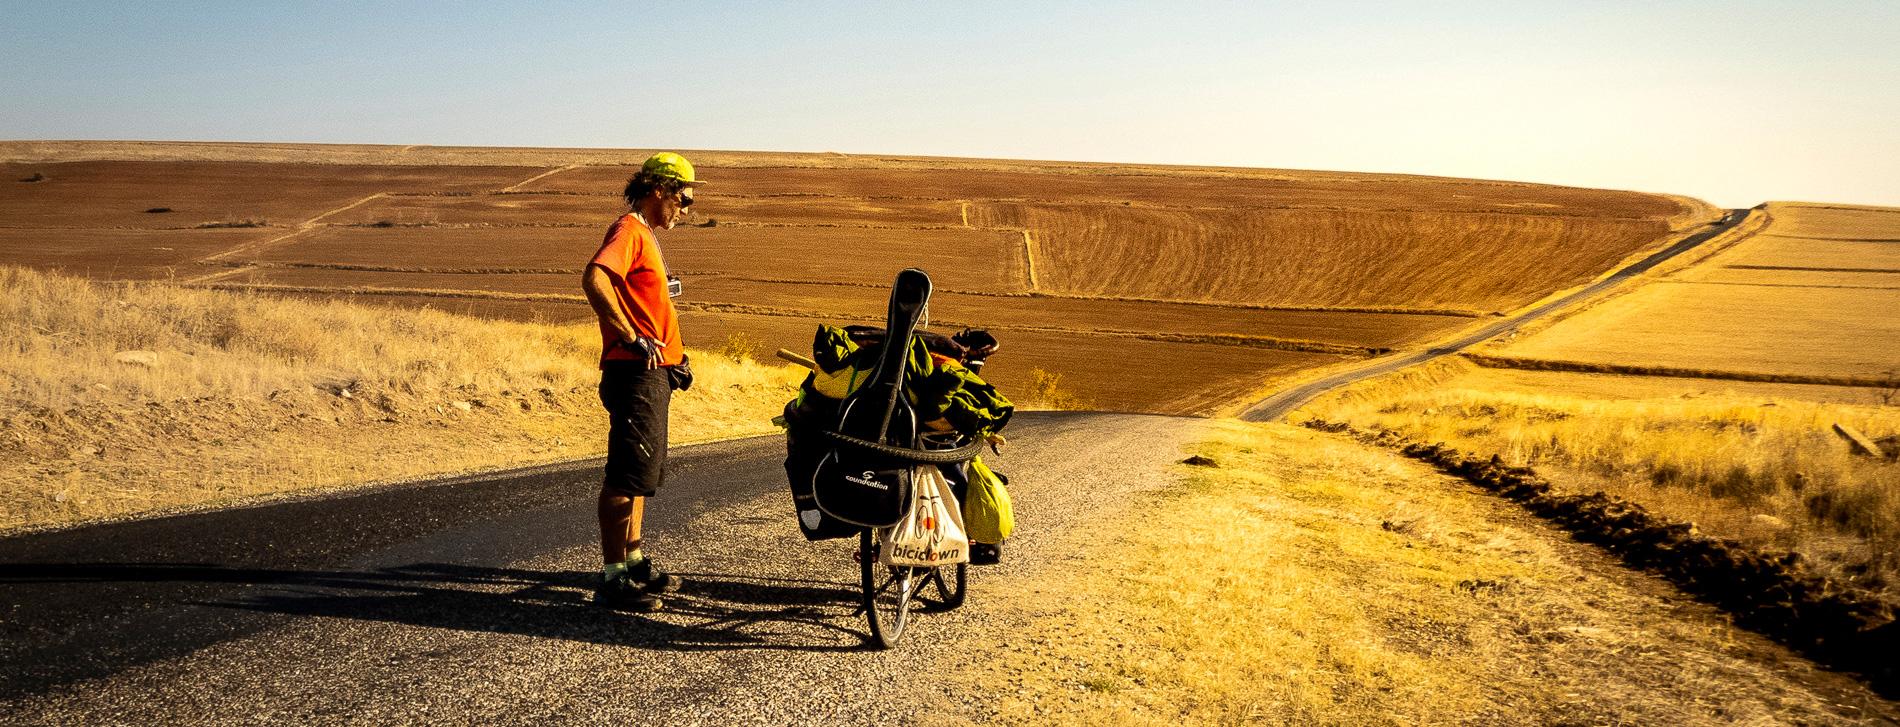 Vuelta al mundo en bicicleta